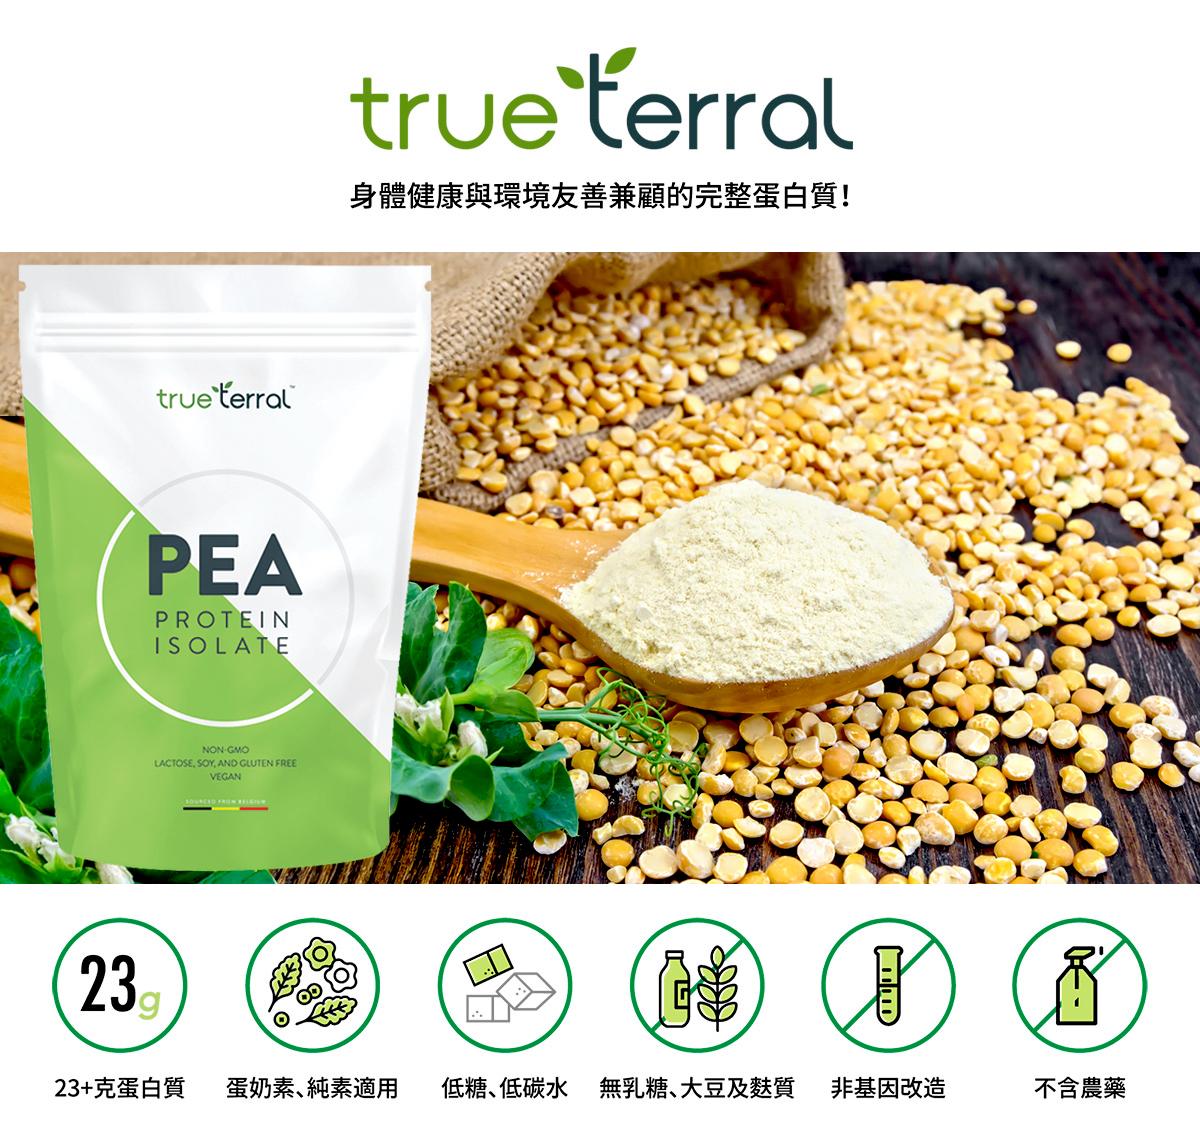 True terral 1